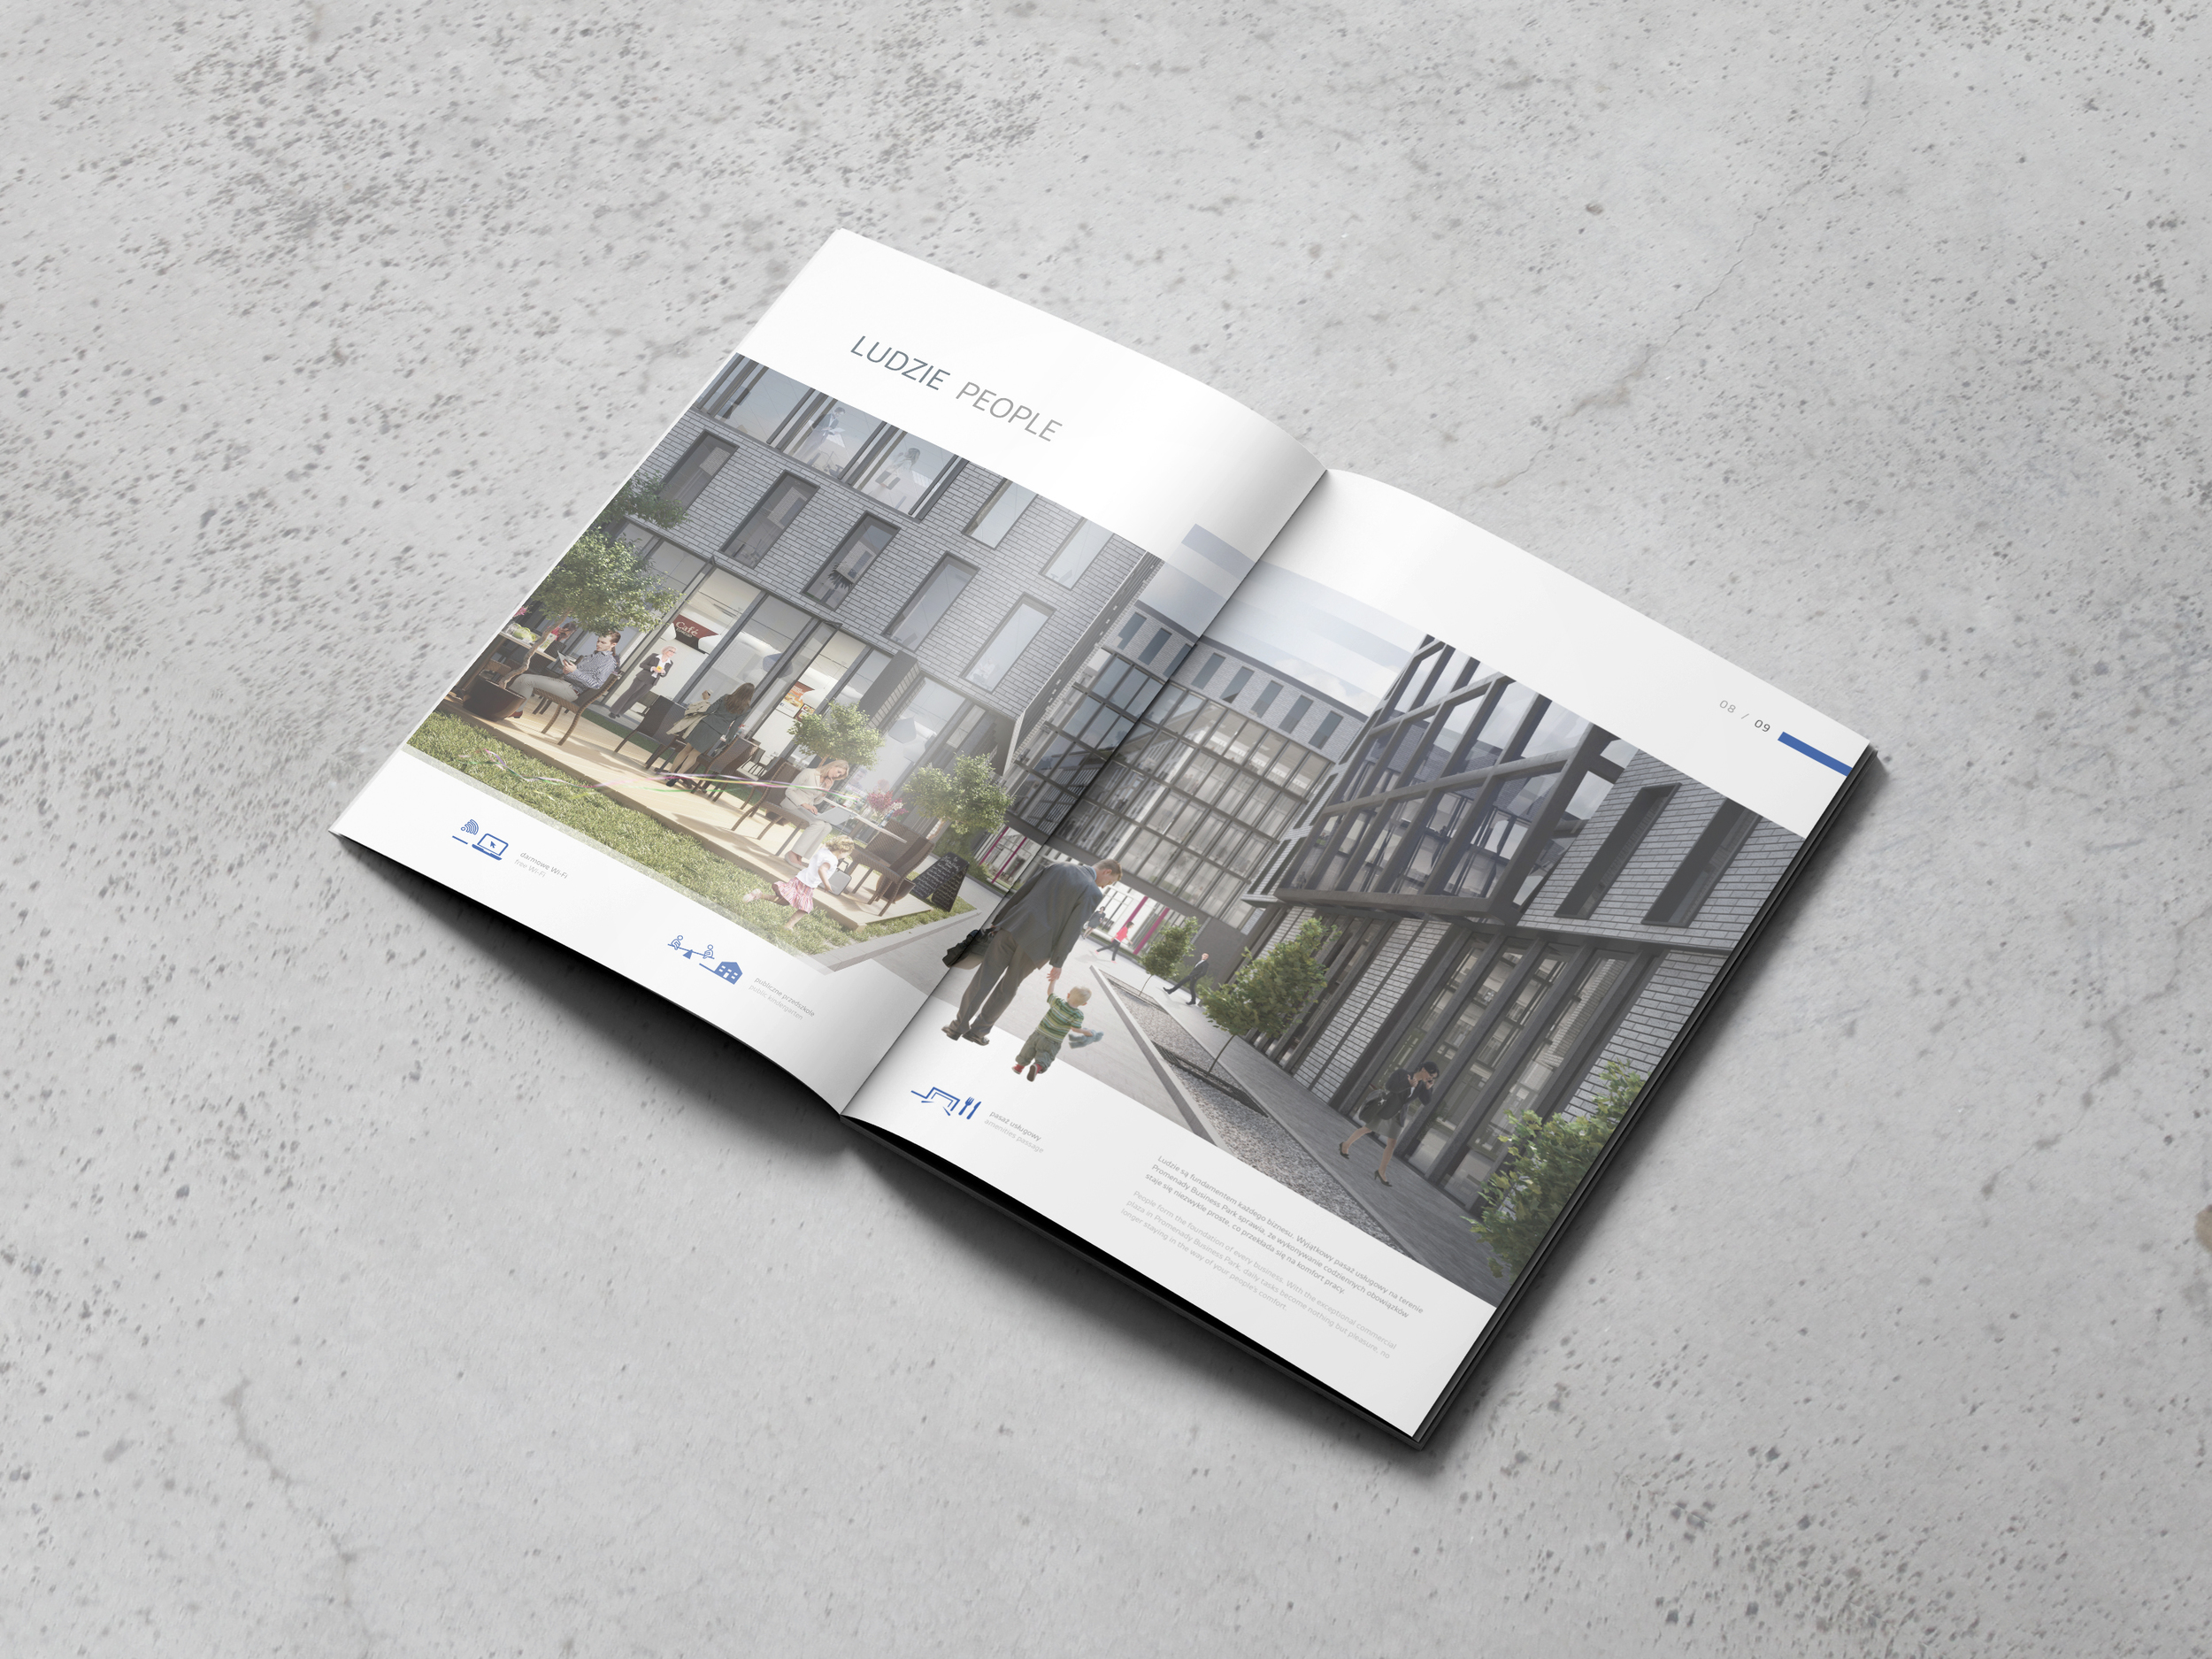 2015 Vantage Promenady brochure 4.jpg